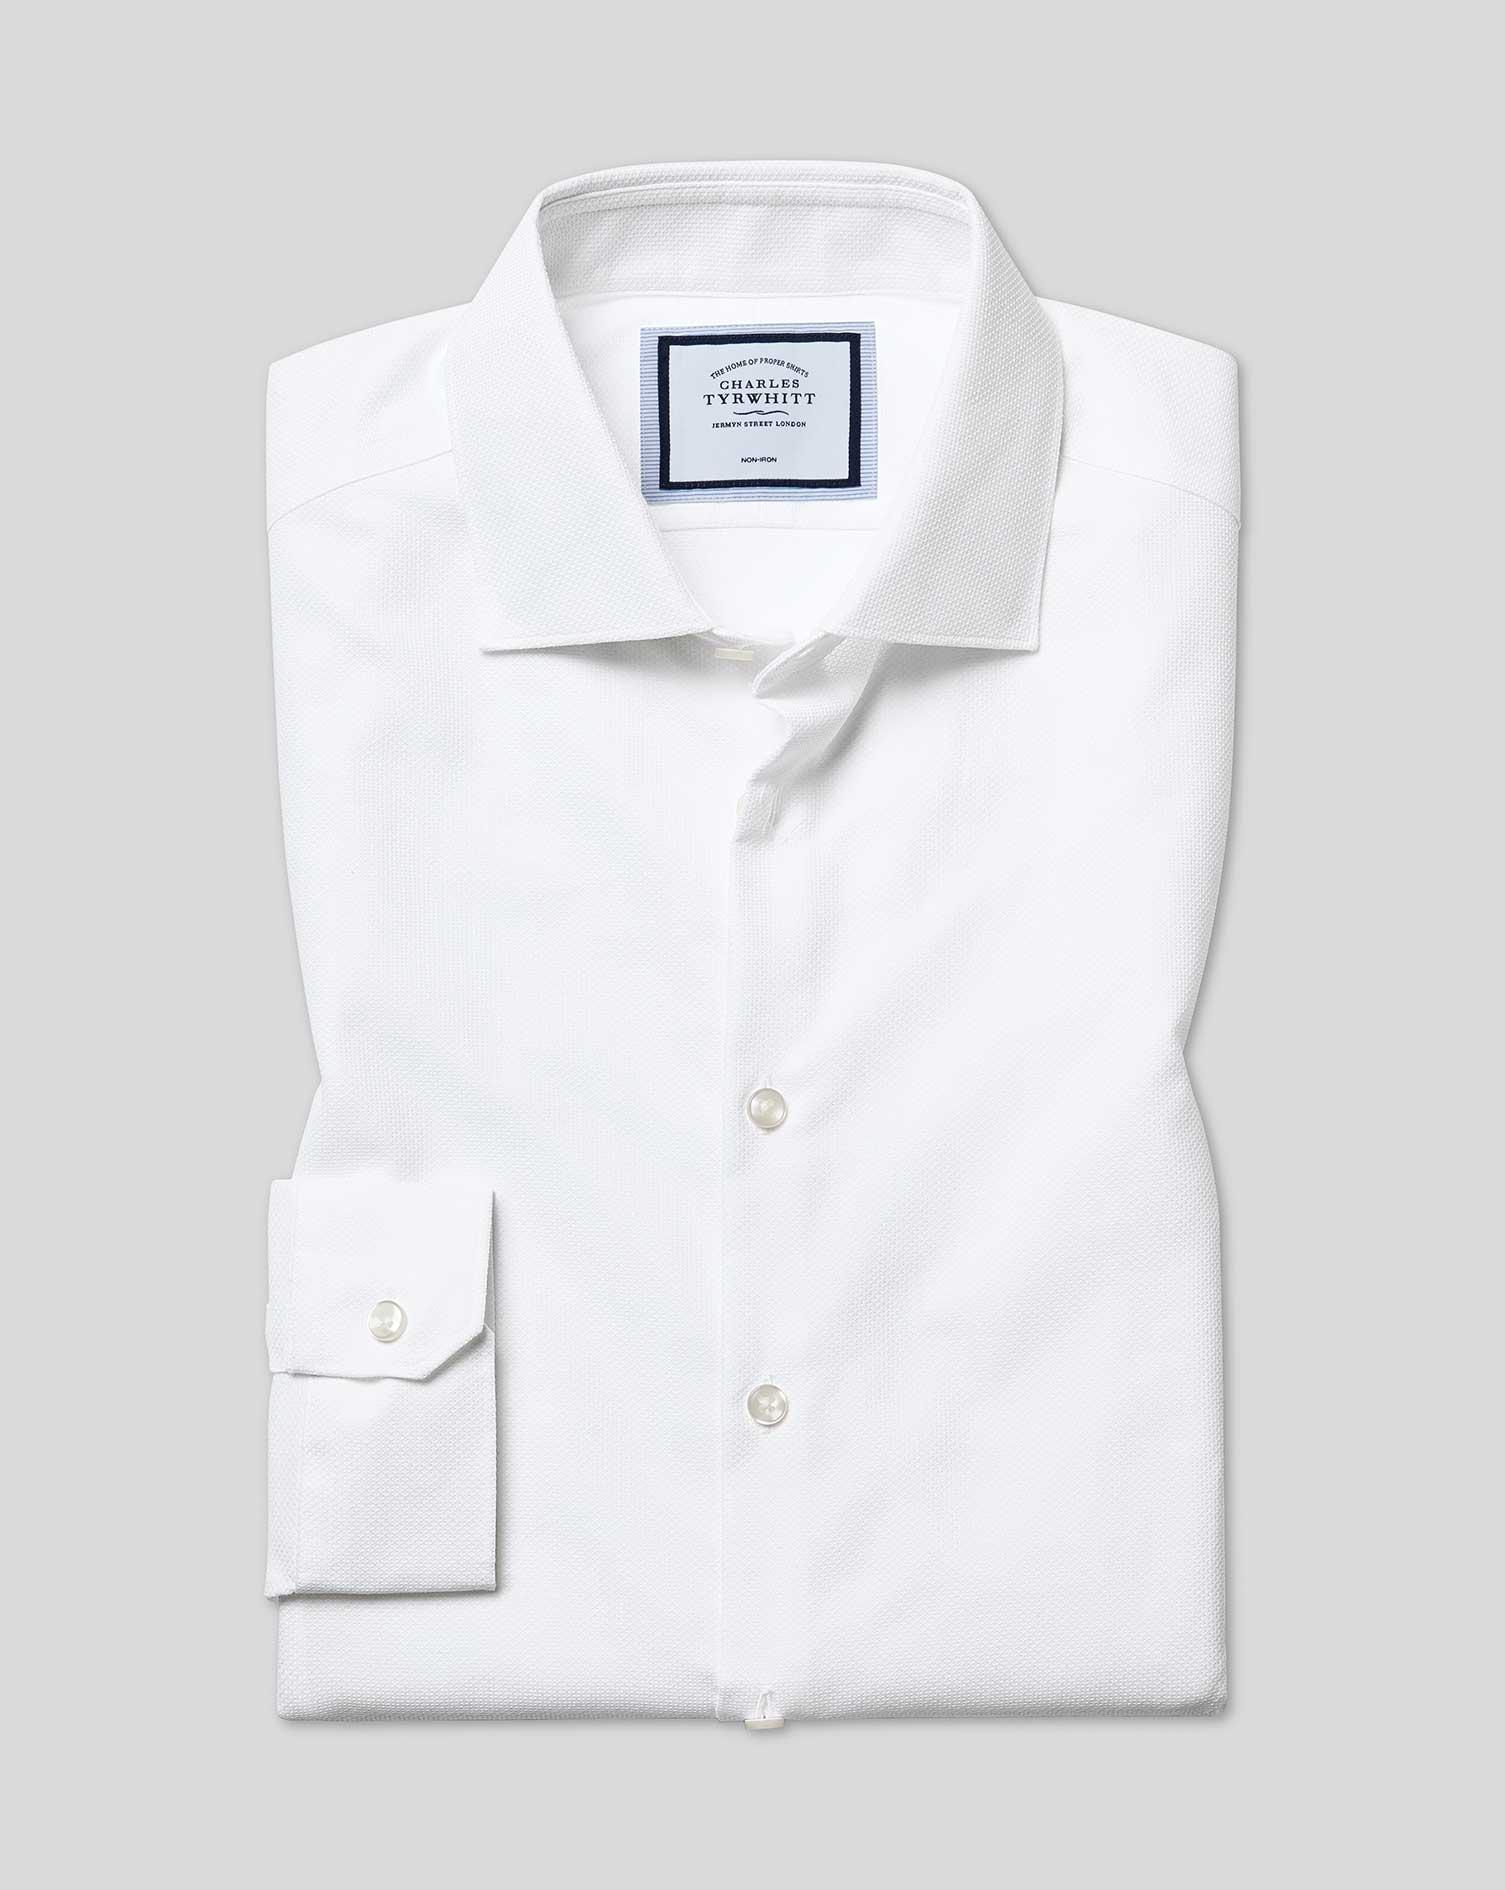 Cotton Super Slim Fit Non-Iron Natural Stretch Textures White Shirt